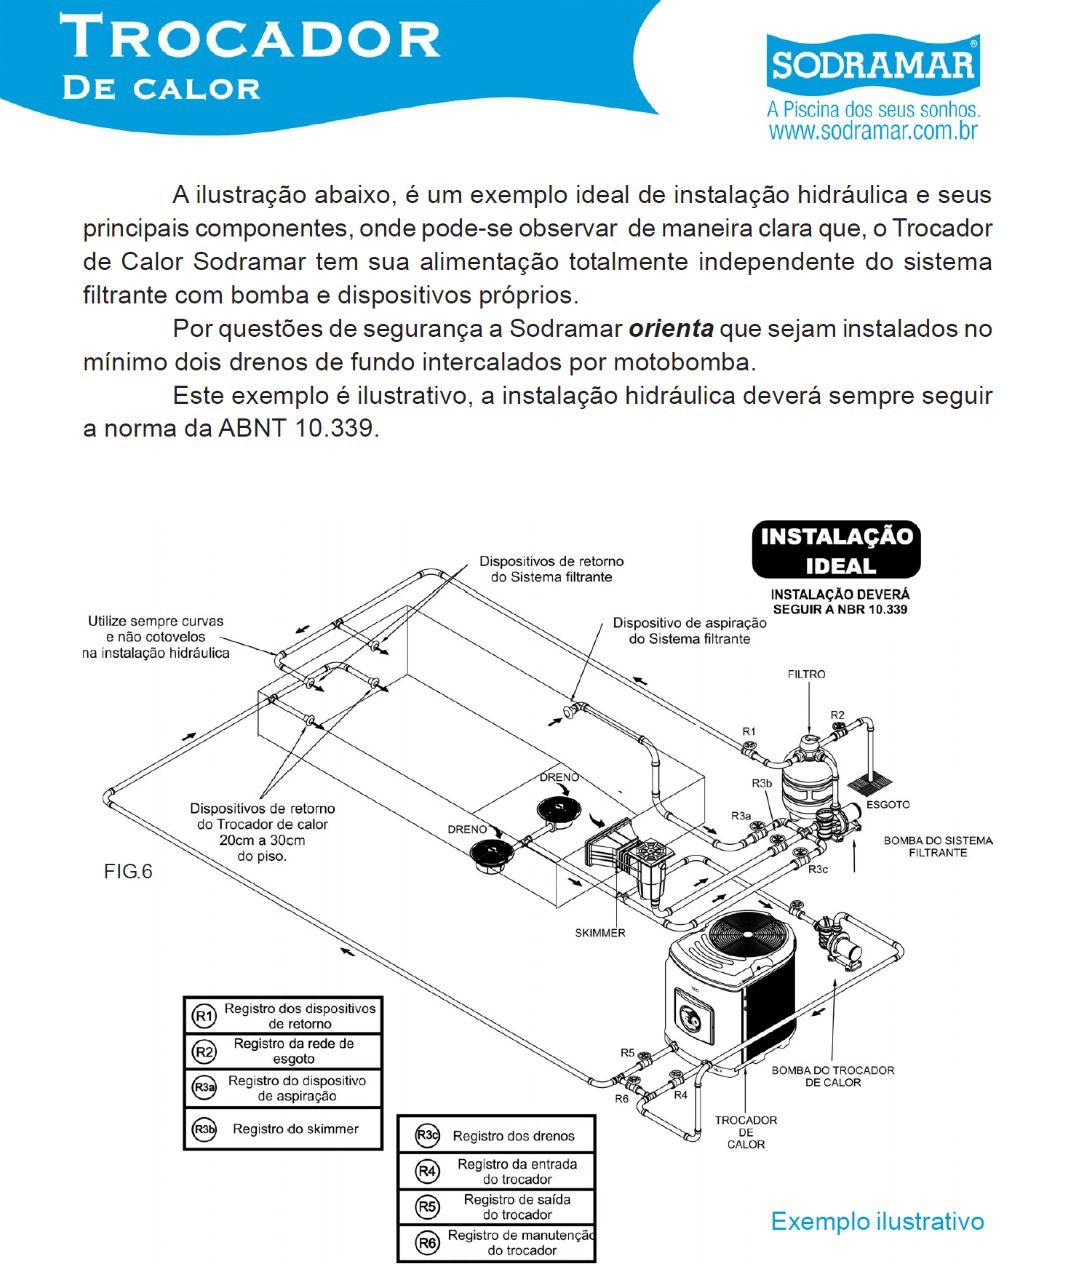 Aquecedor de piscina Yes - Trocador de Calor SD-160 Trif 220V